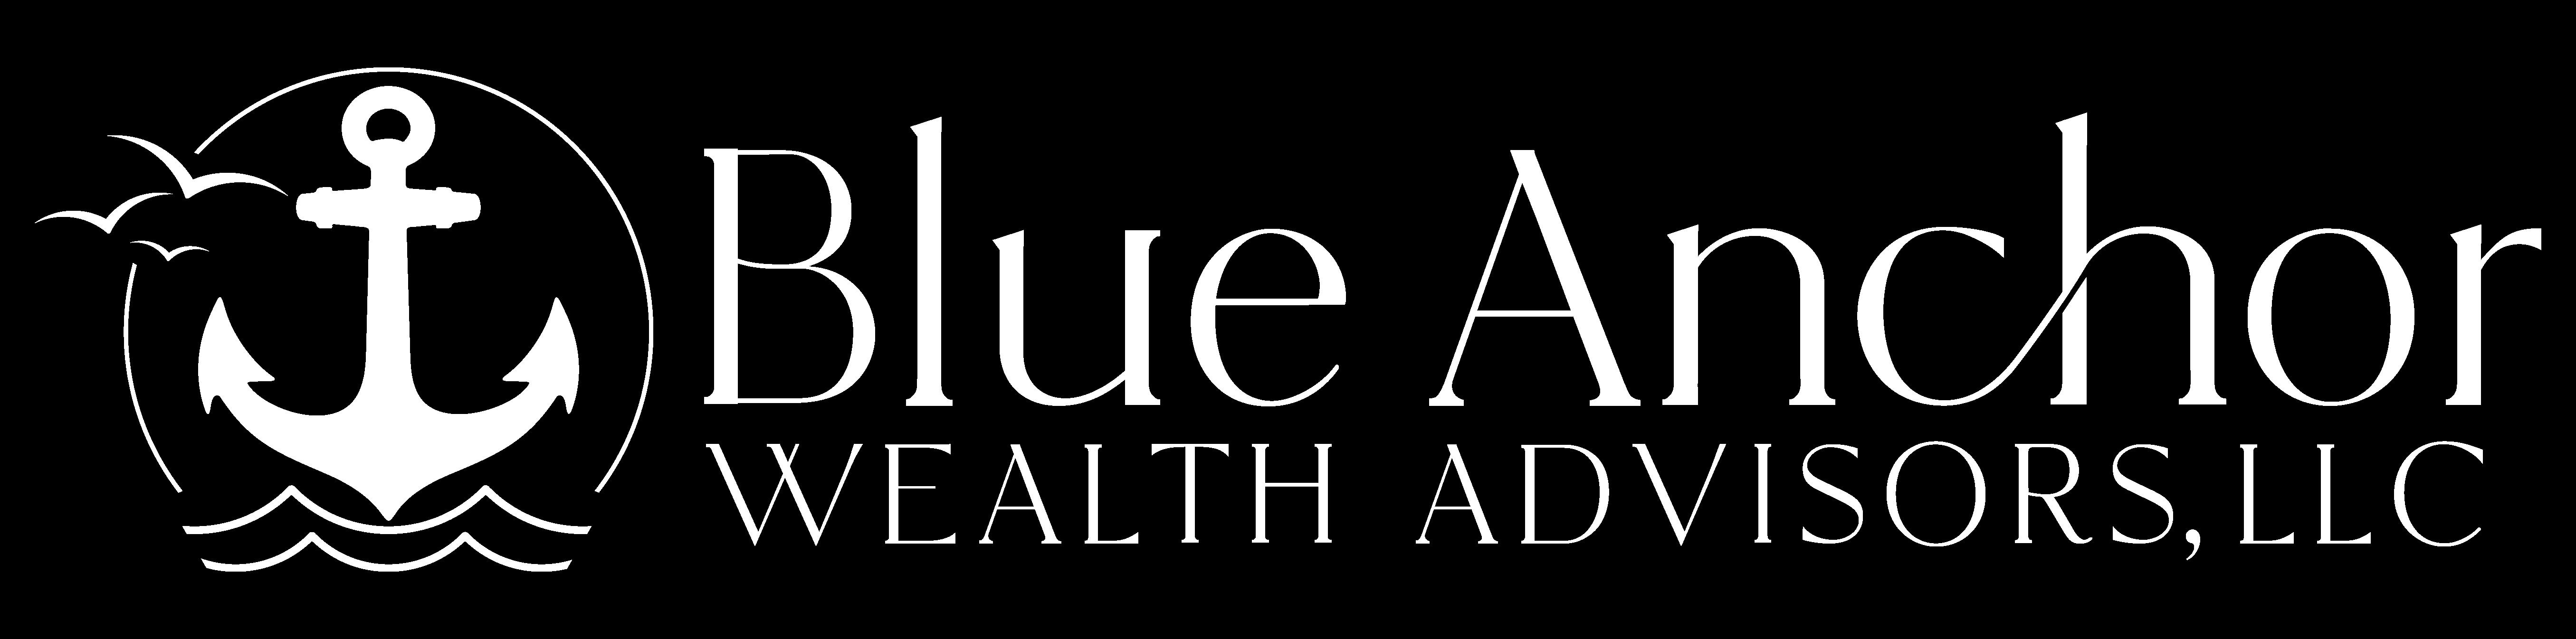 Blue Anchor Wealth Advisors, LLC